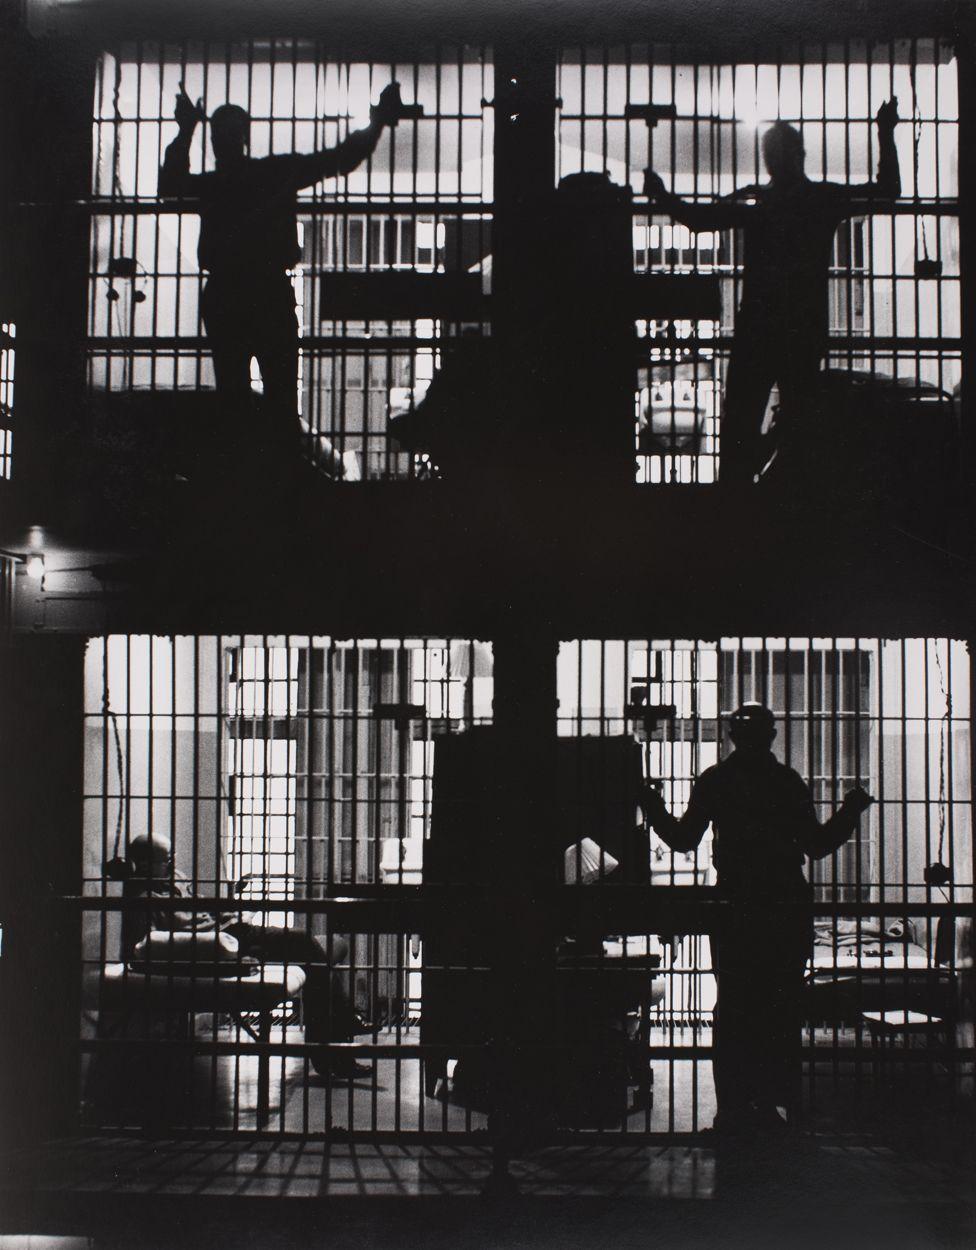 Prison cell block - Jackson, Michigan, 1953